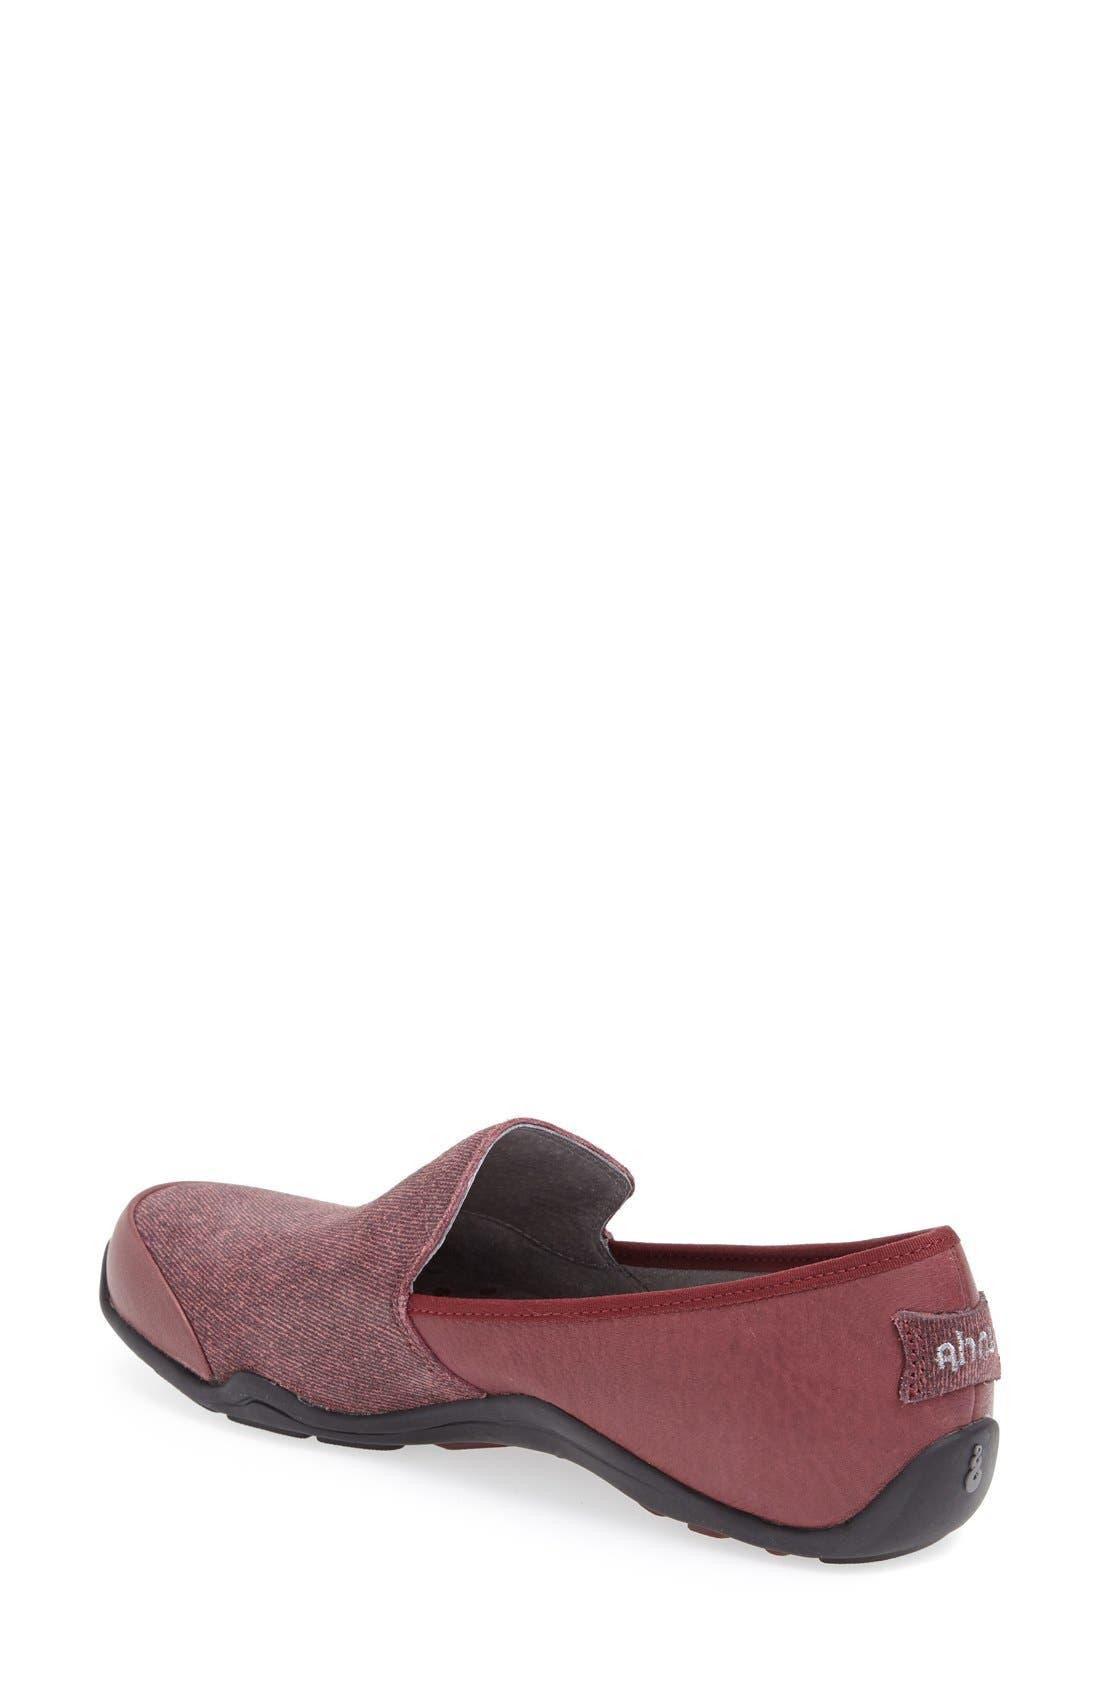 Alternate Image 2  - Ahnu 'Penny' Leather Loafer (Women)